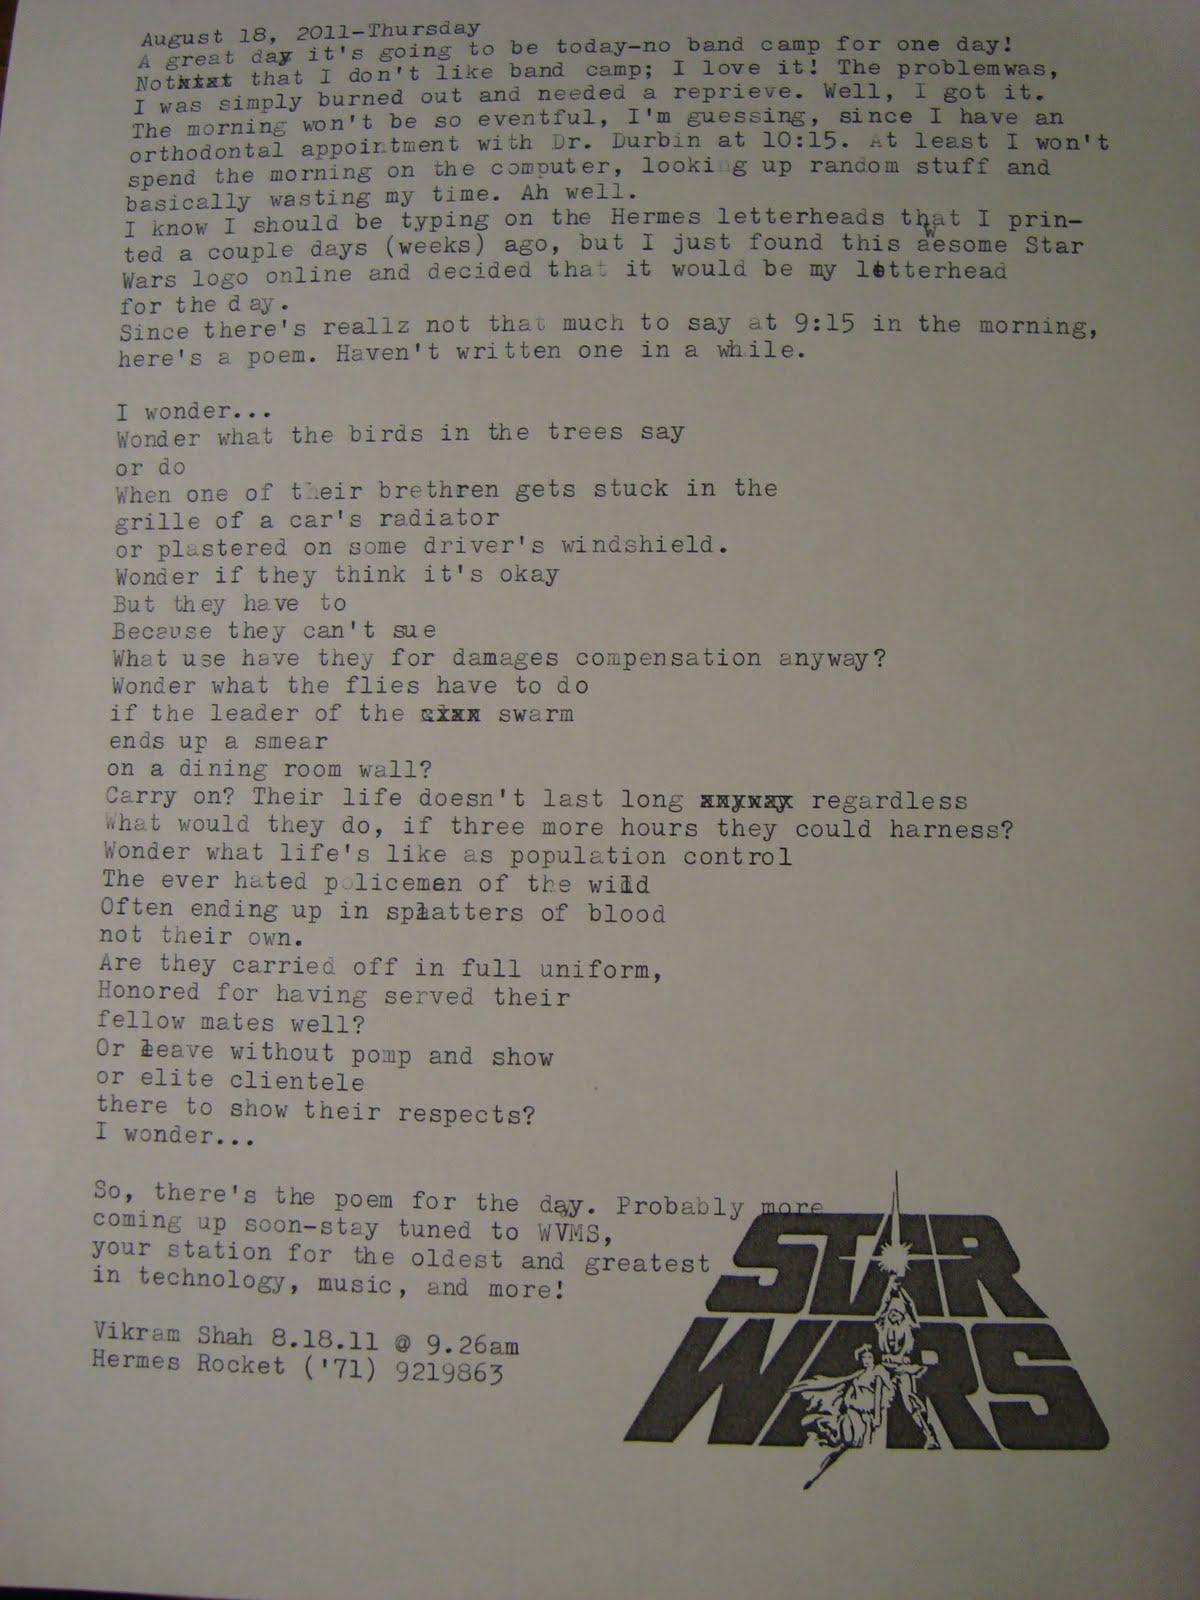 Coolstuff I Wonder Typecast Poem